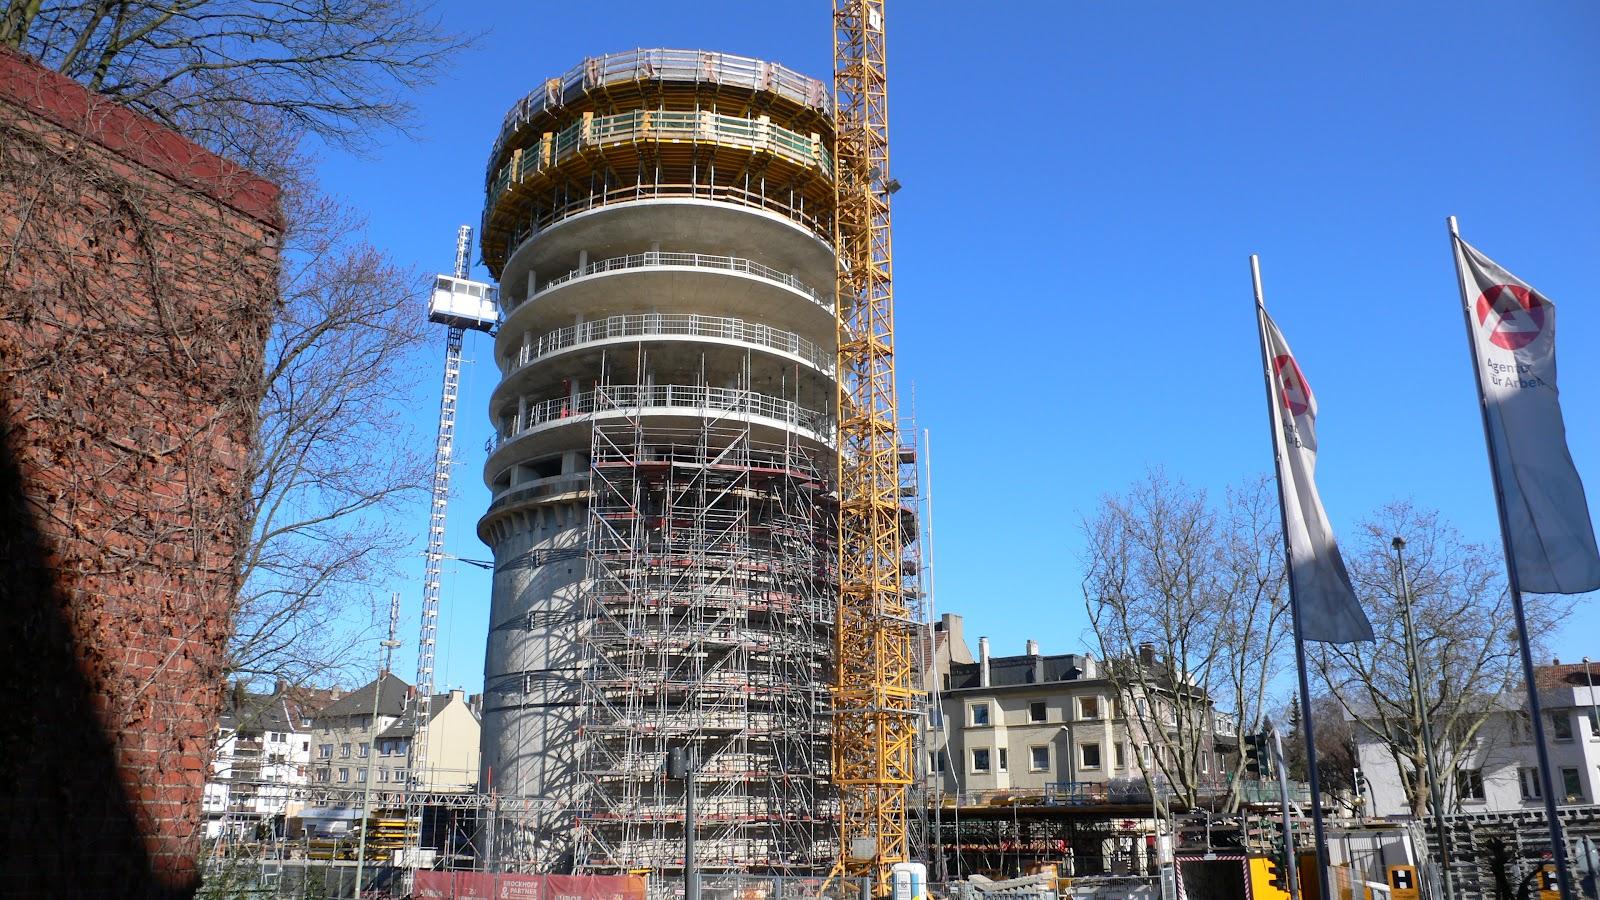 Häuserbau Bochum bauprojekte bochum april 2012